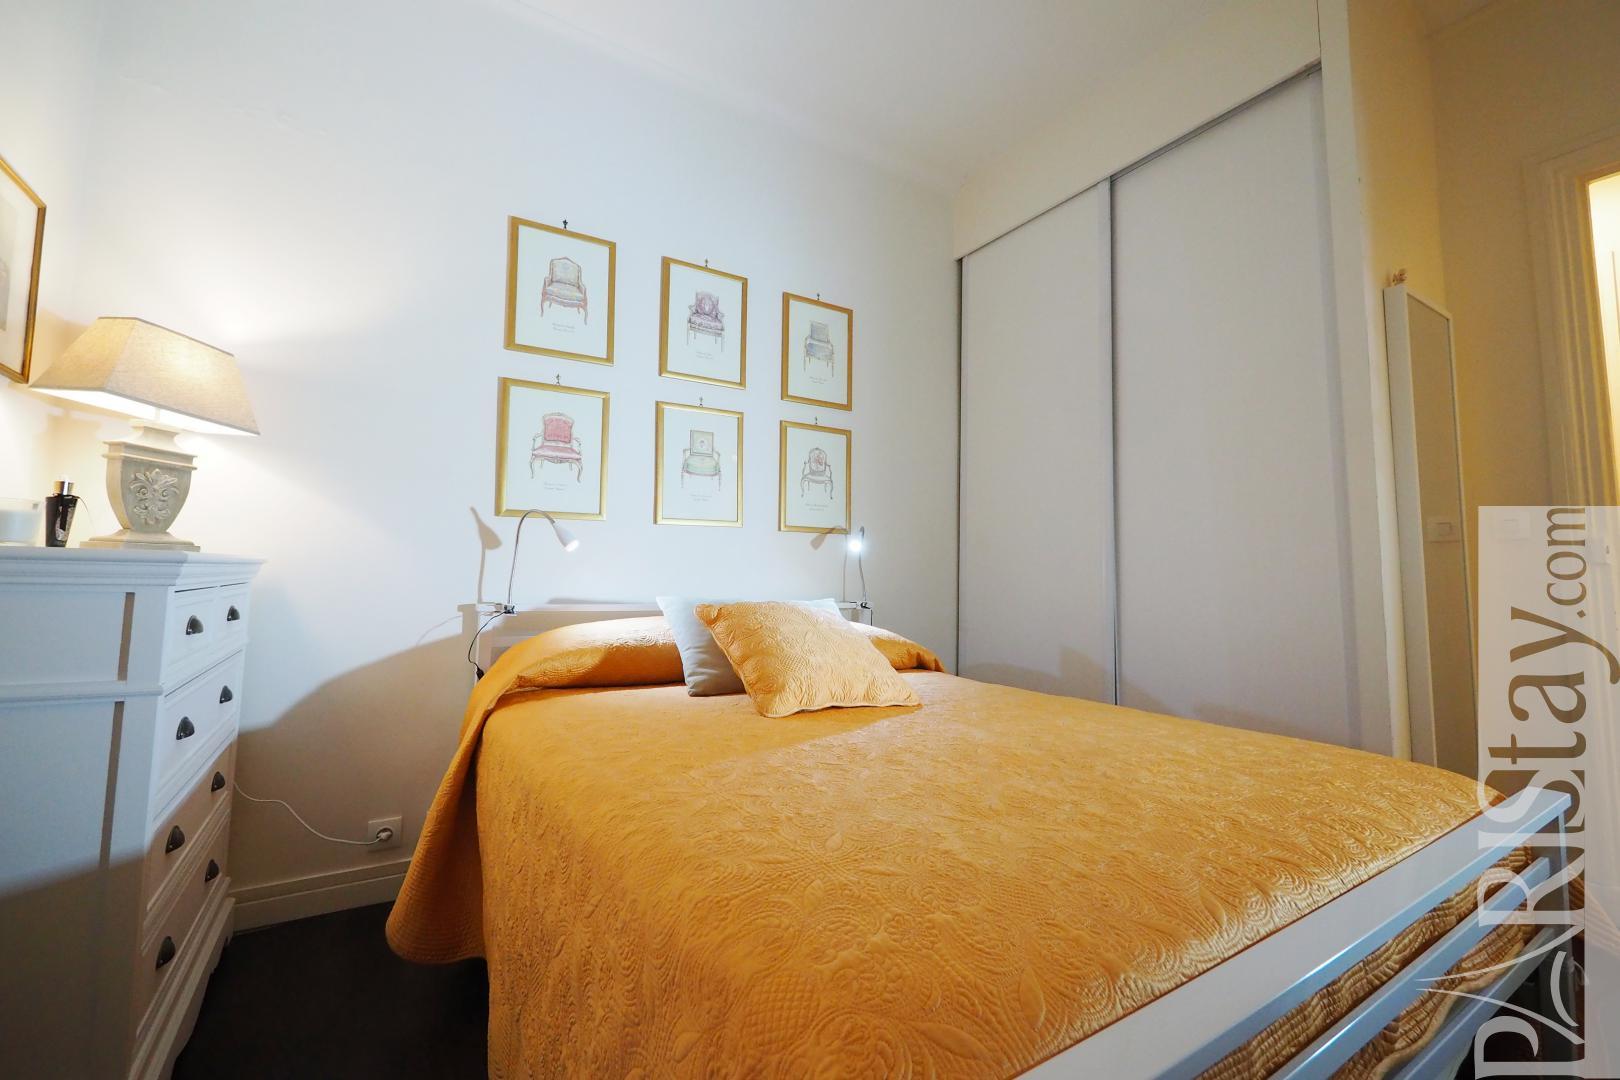 location appartement meuble paris t3 2 chambres equip commerce. Black Bedroom Furniture Sets. Home Design Ideas